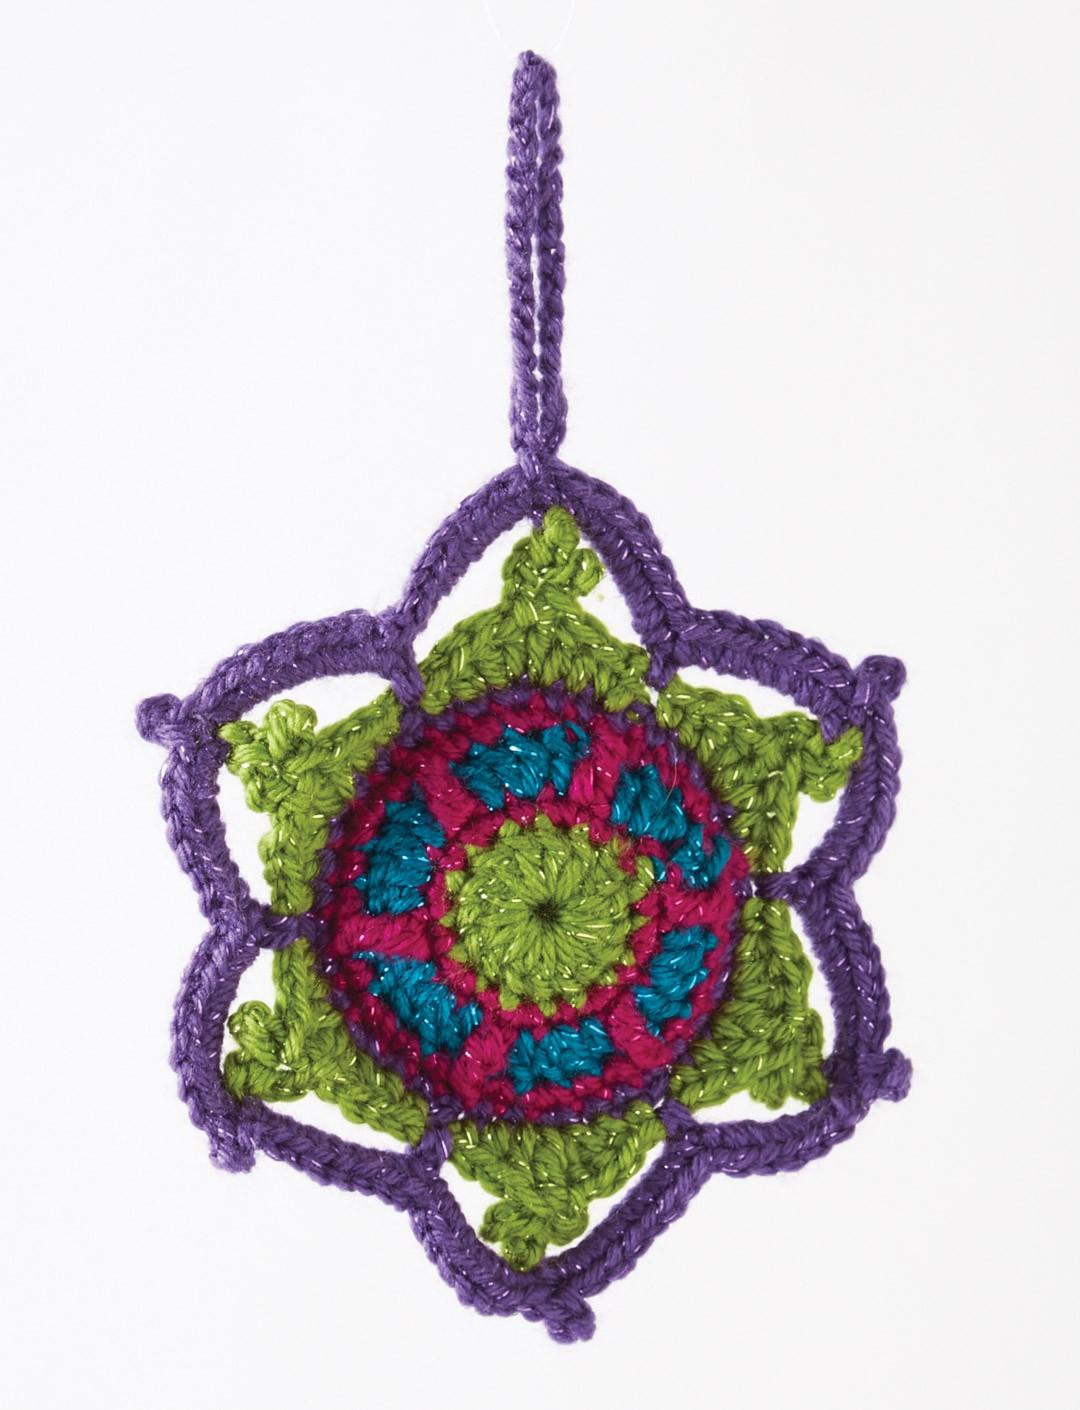 Crochet Jewelled Snowflake Tutorial The Crochet Crowd